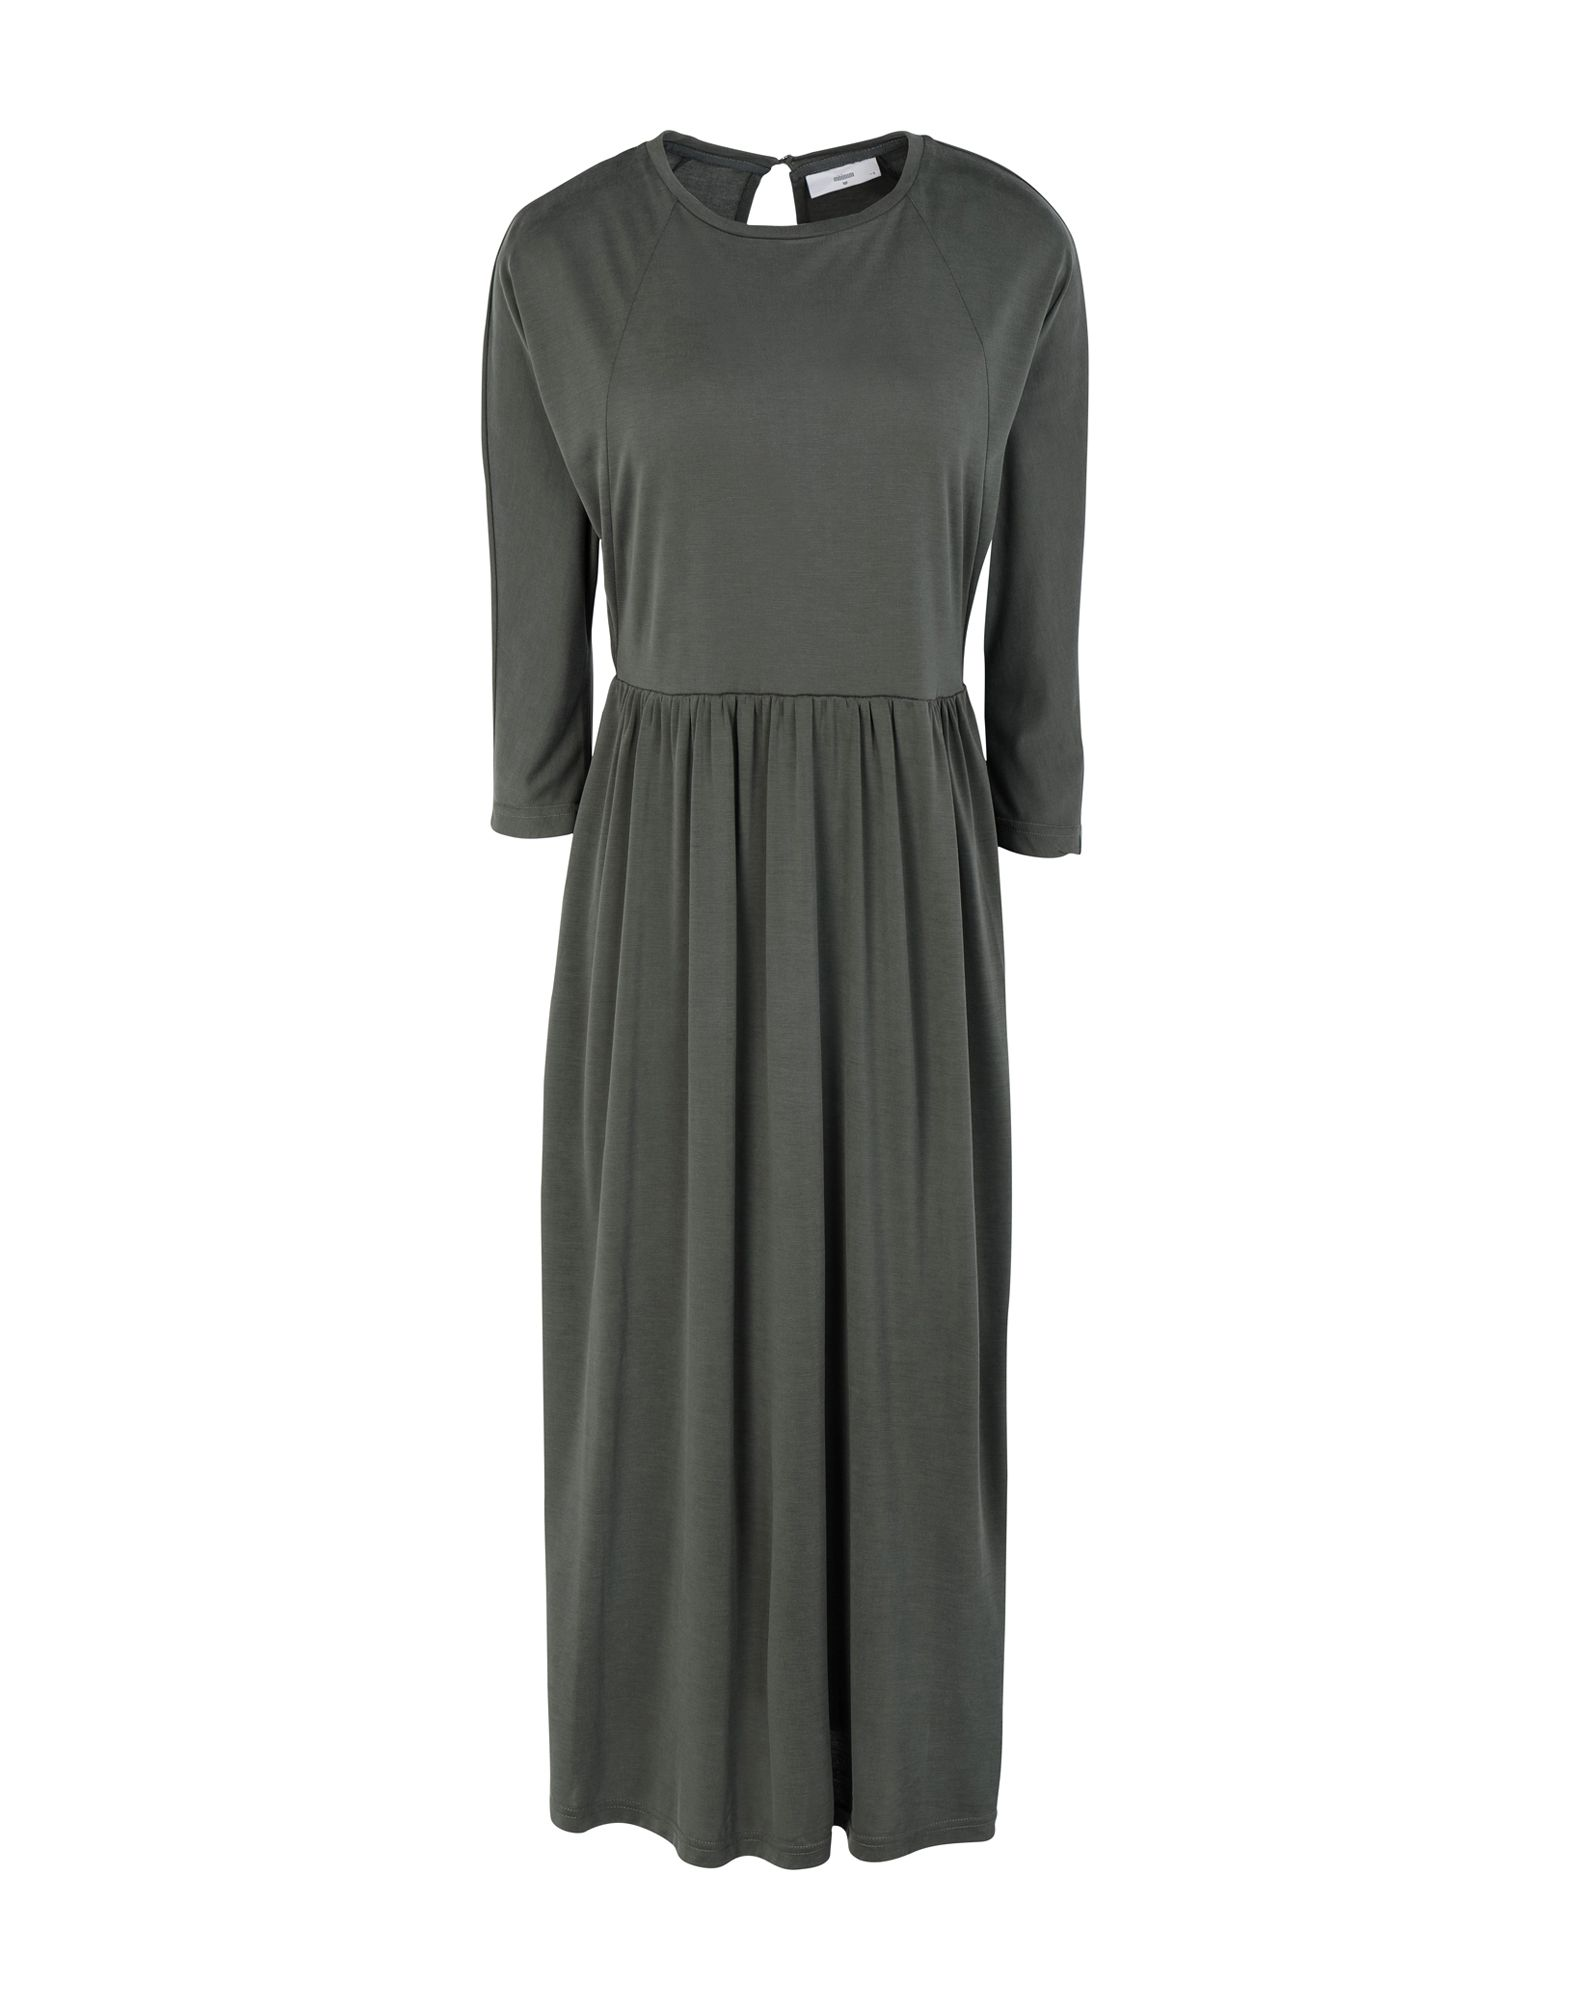 MINIMUM Платье длиной 3/4 boss black платье длиной 3 4